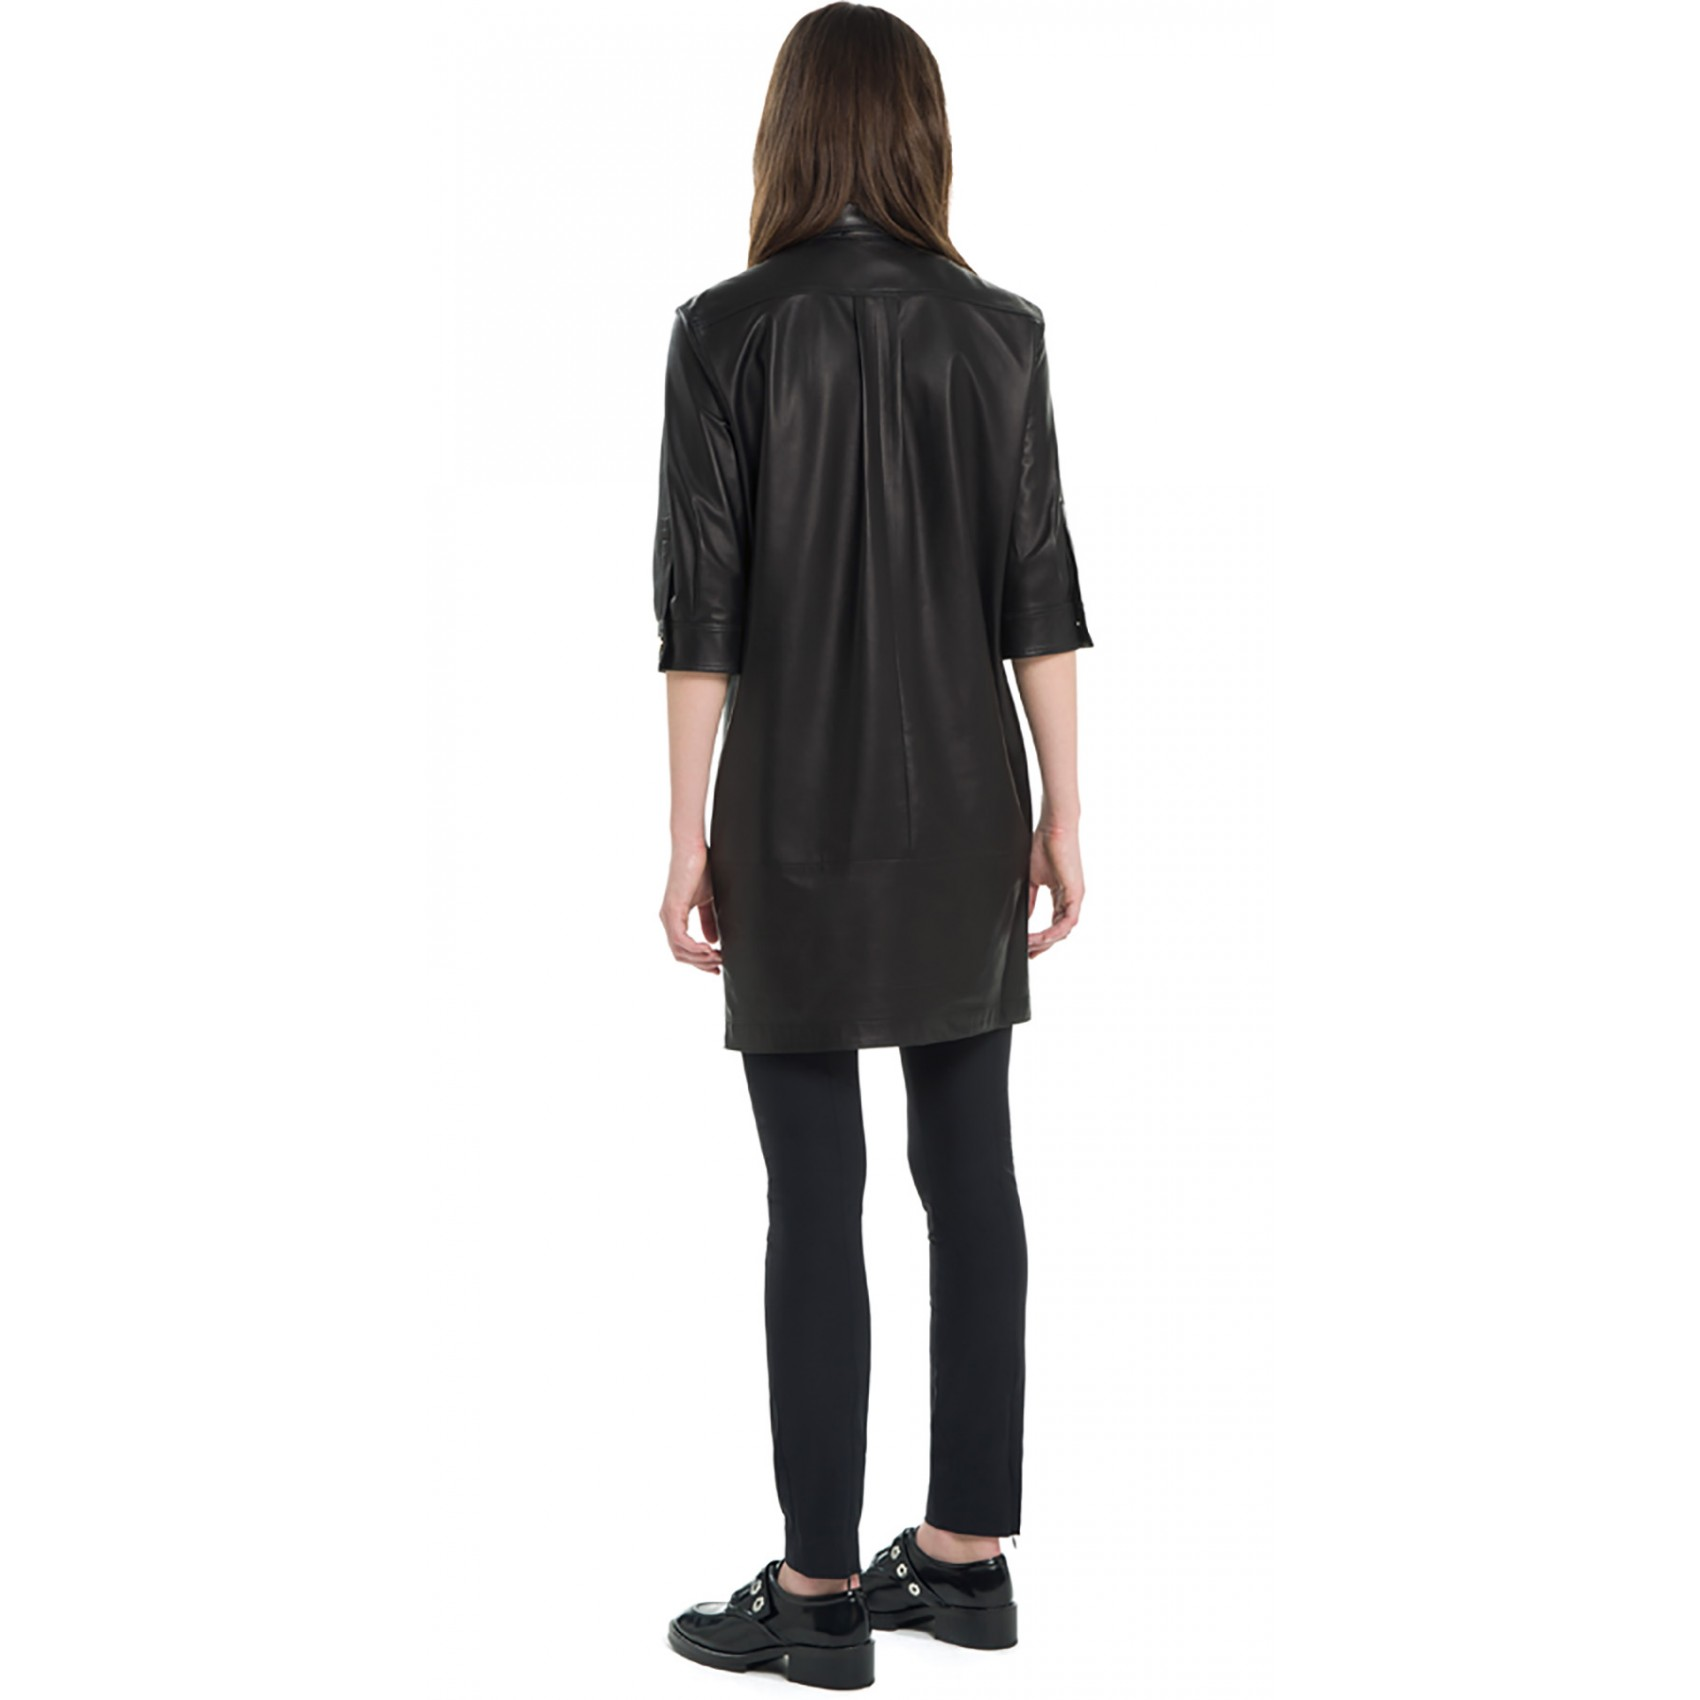 Sandro Rise Leather Shirt Dress at Sandro US